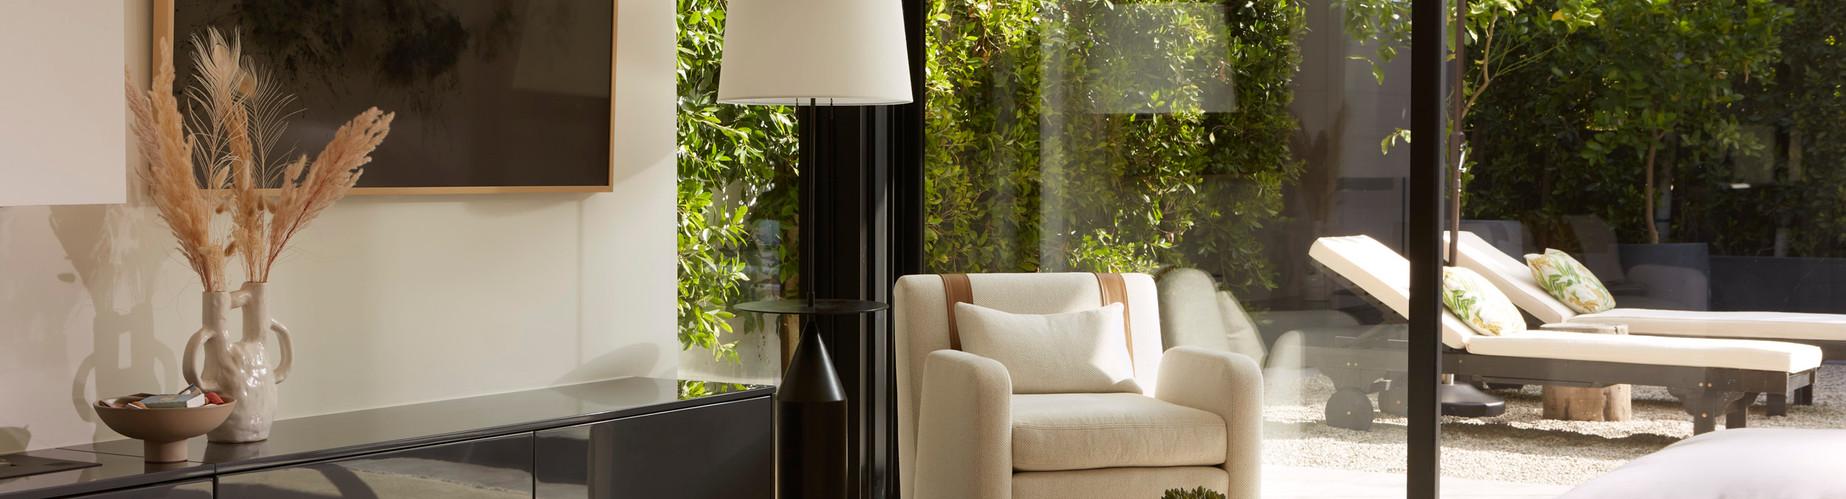 Studio City Hamptons Living Room.jpg